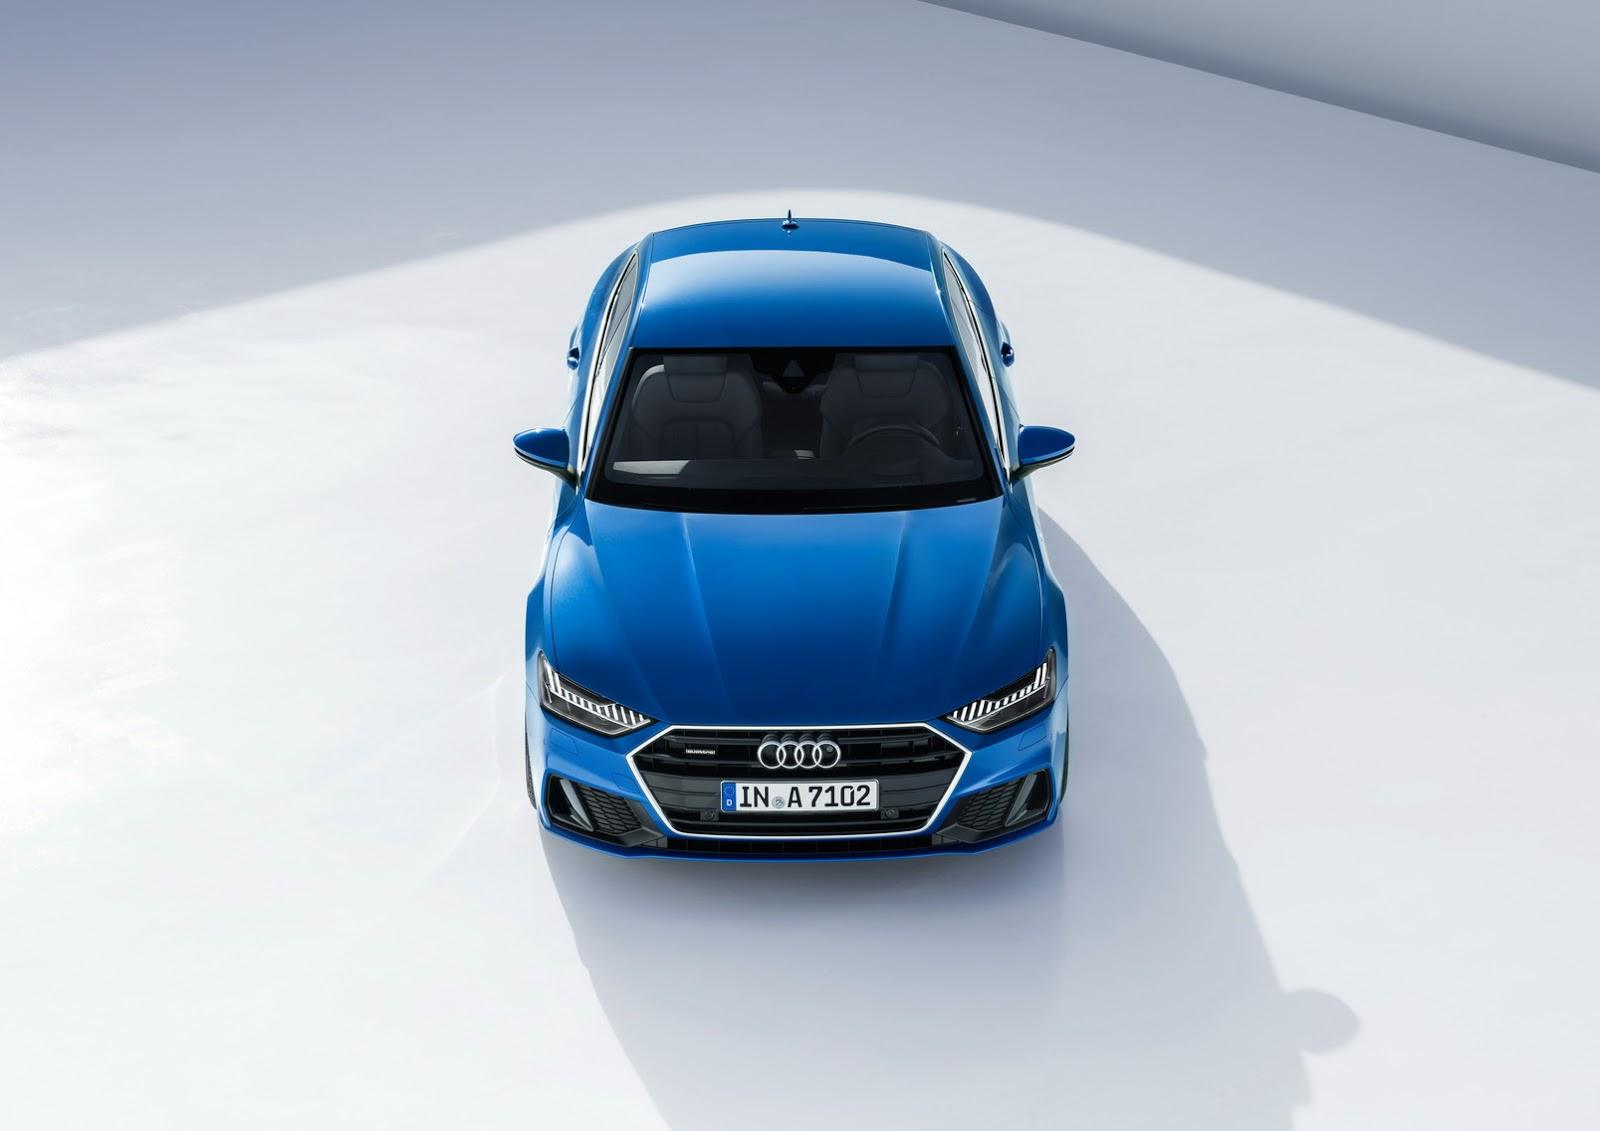 2018_Audi_A7_Sportback_0021